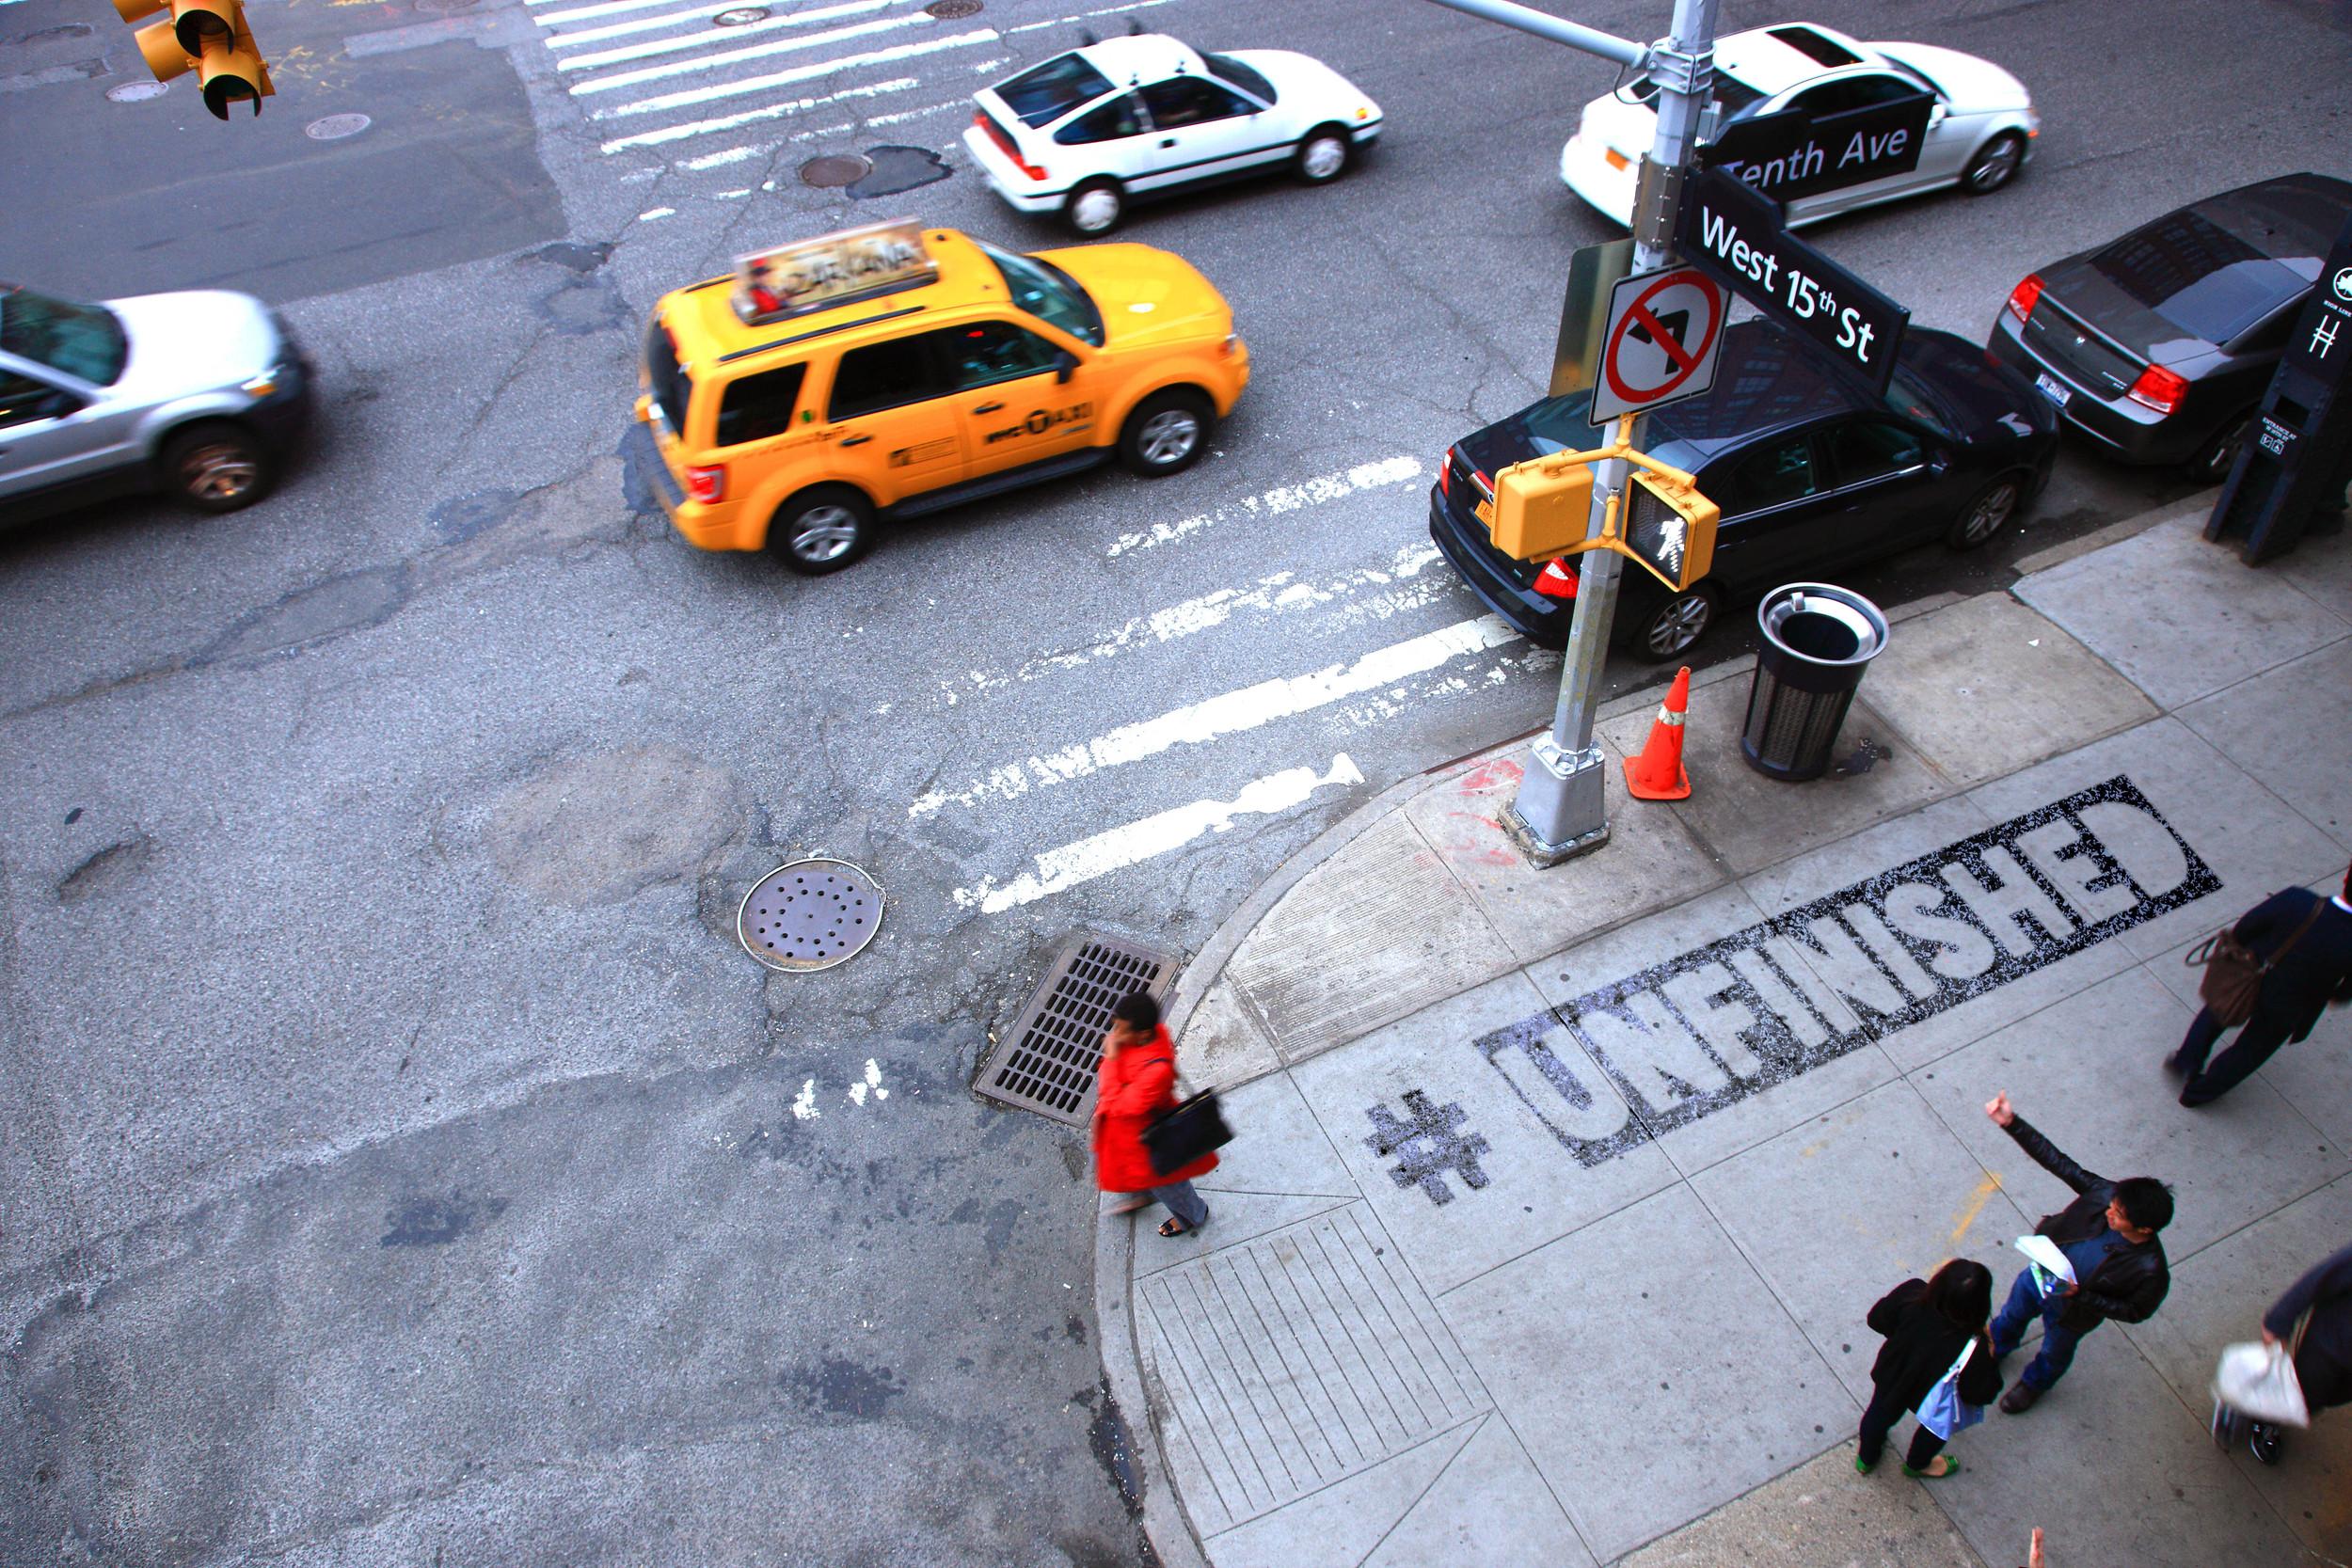 Urban Stencil PR